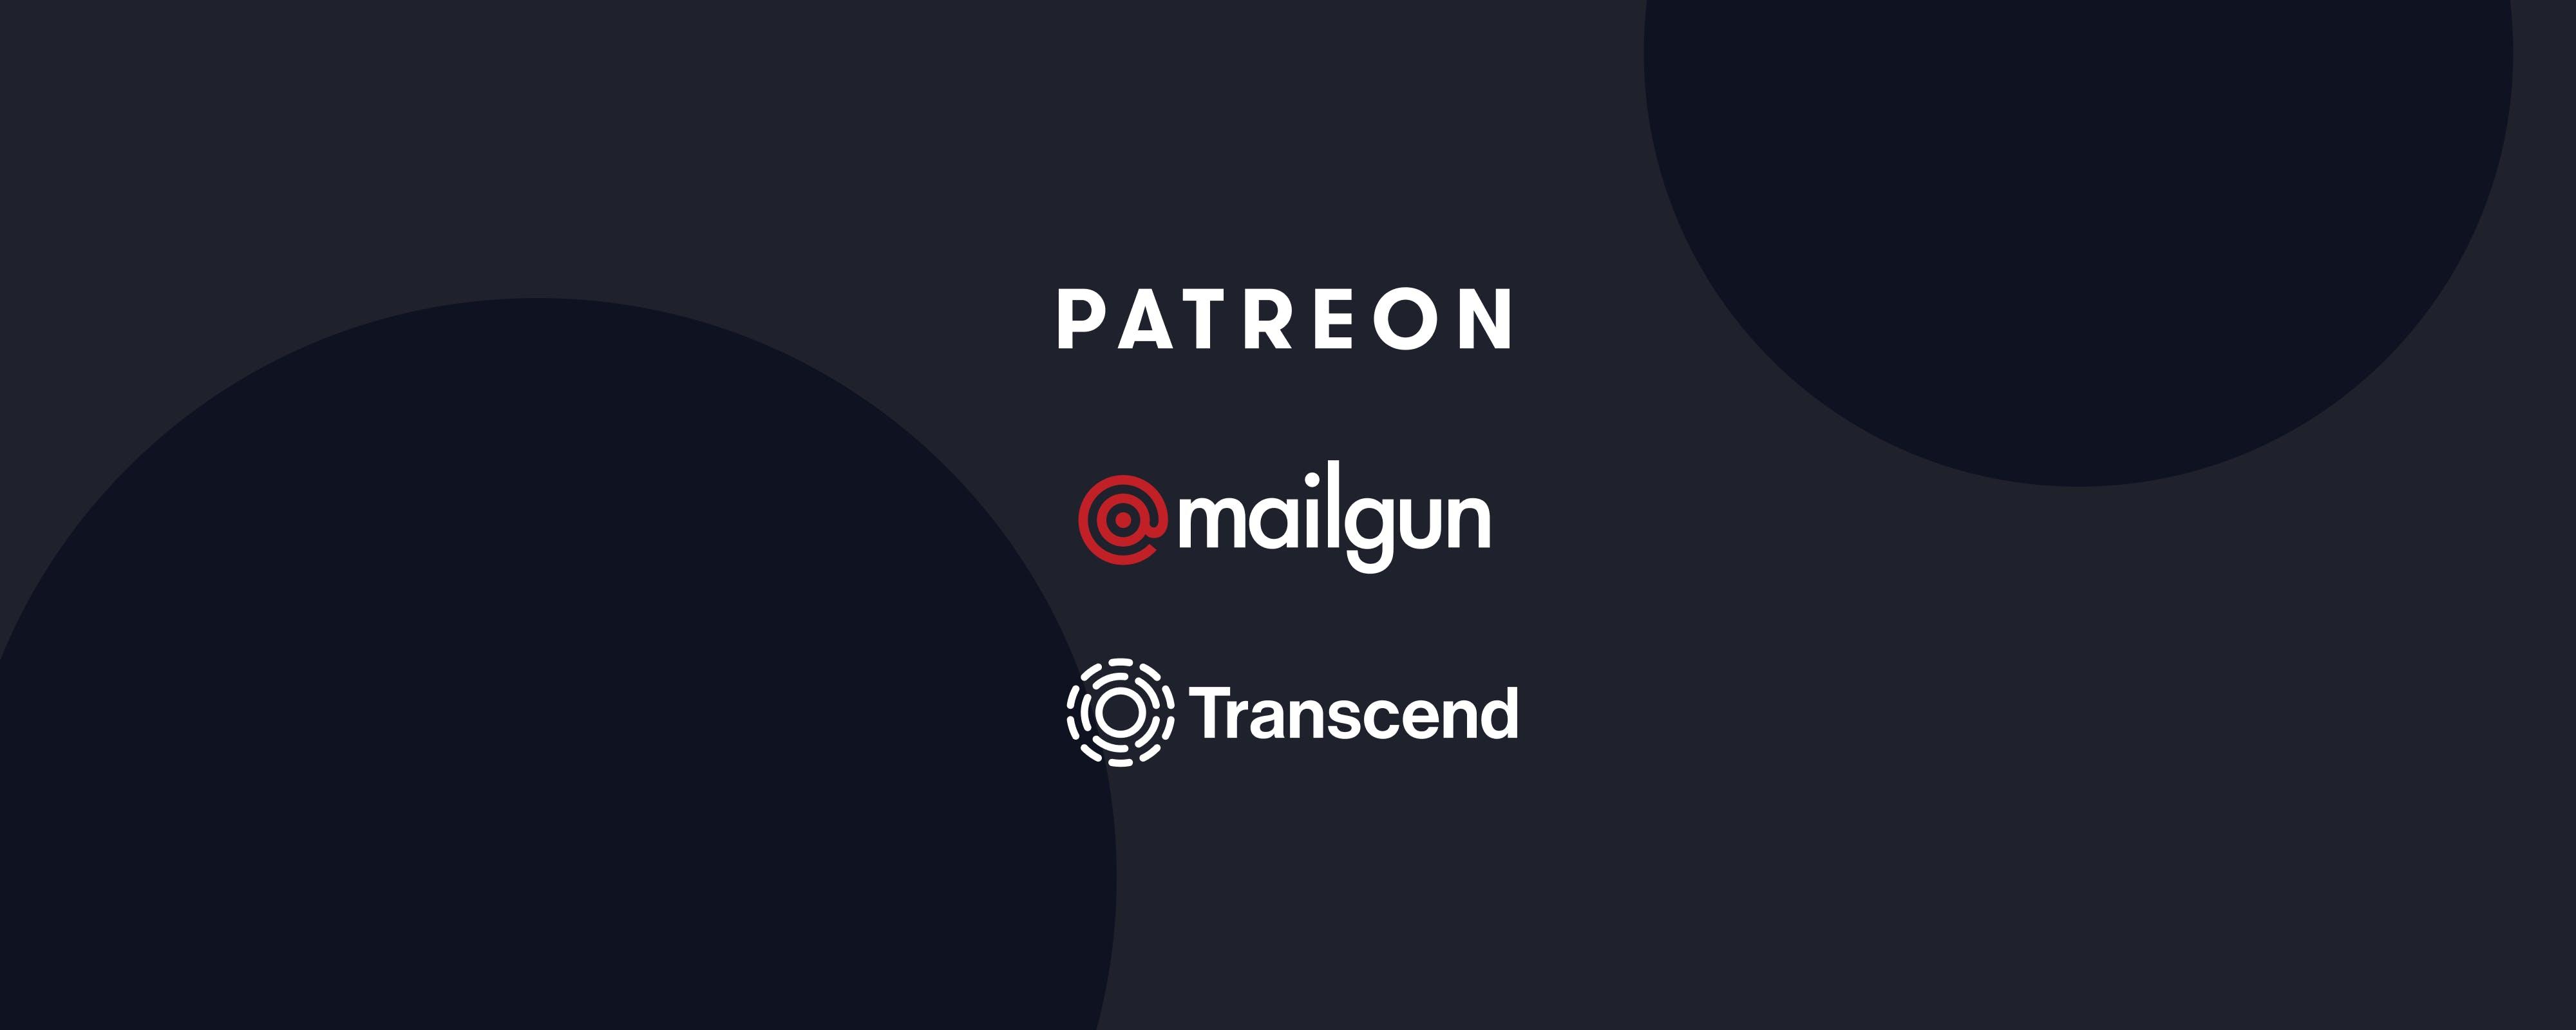 Patreon, Mailgun, Transcend logos